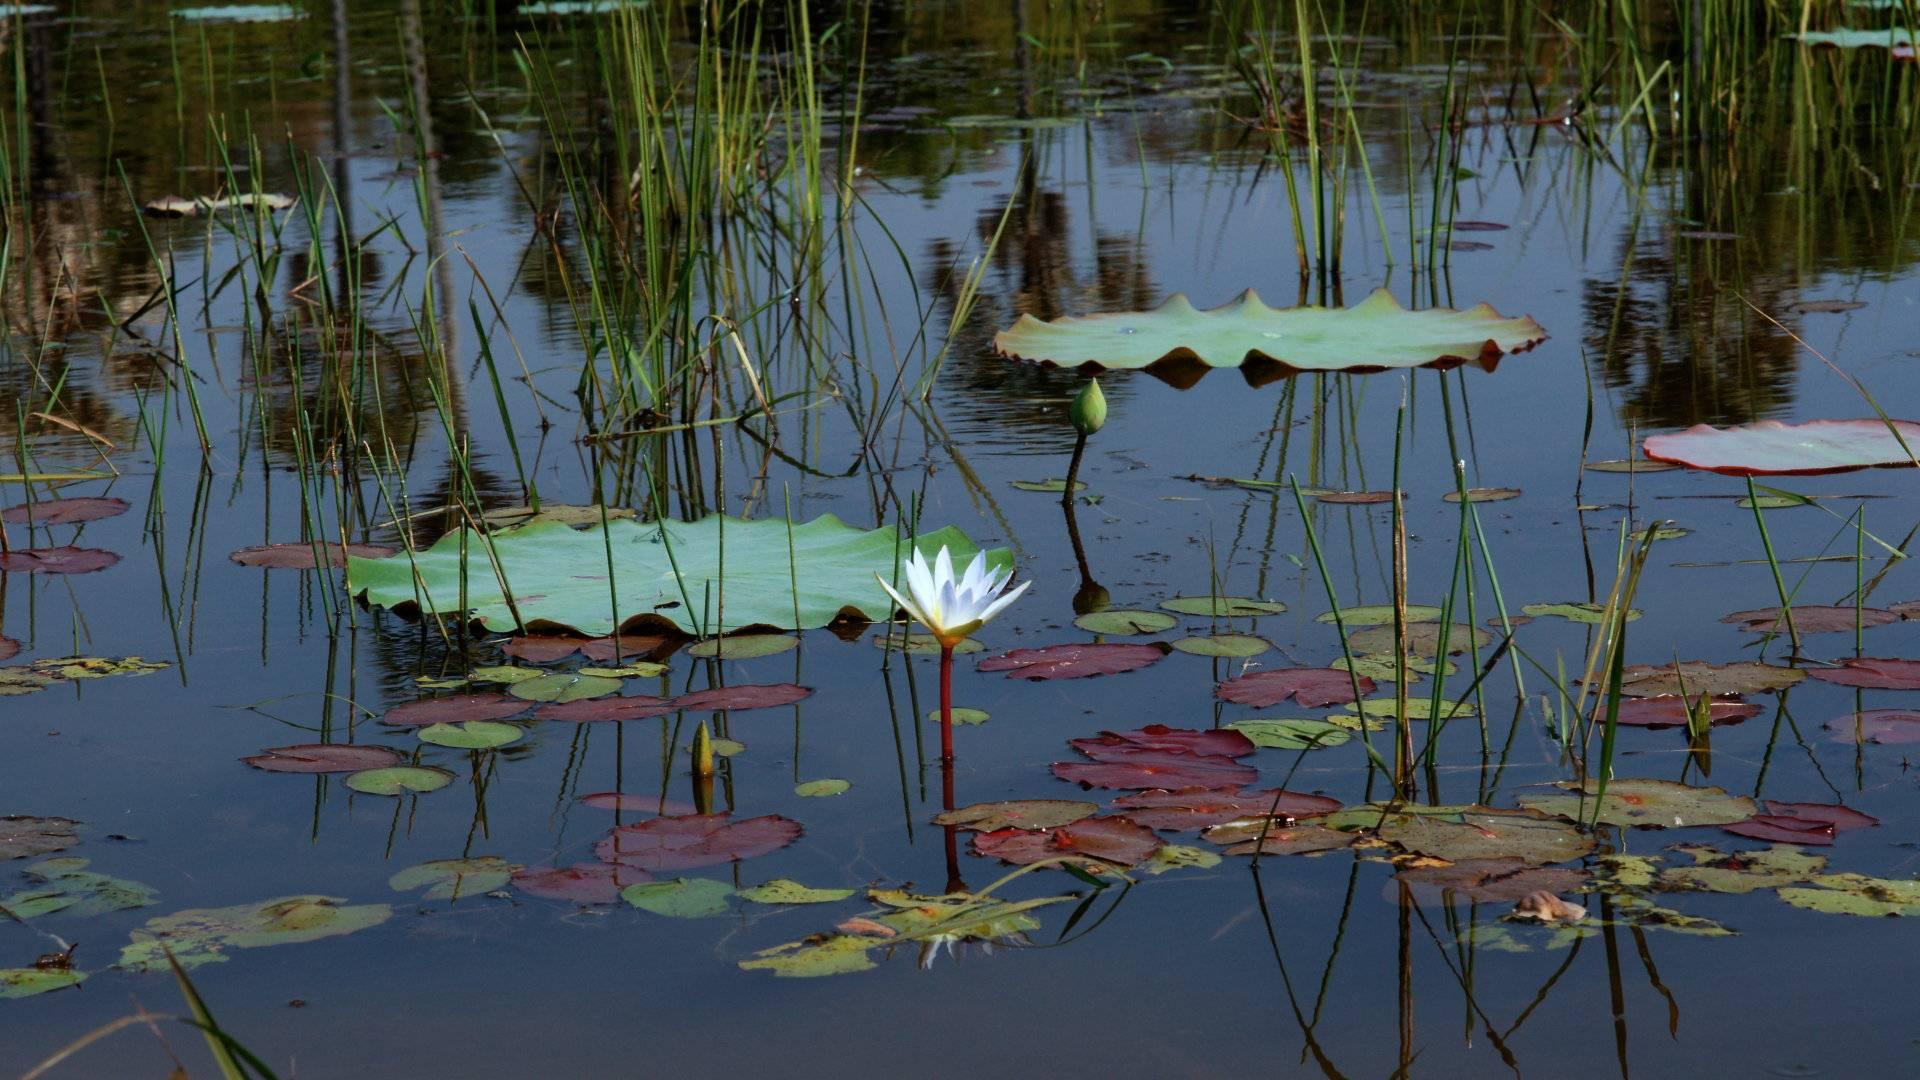 Water lily    743416 HD Wallpaper